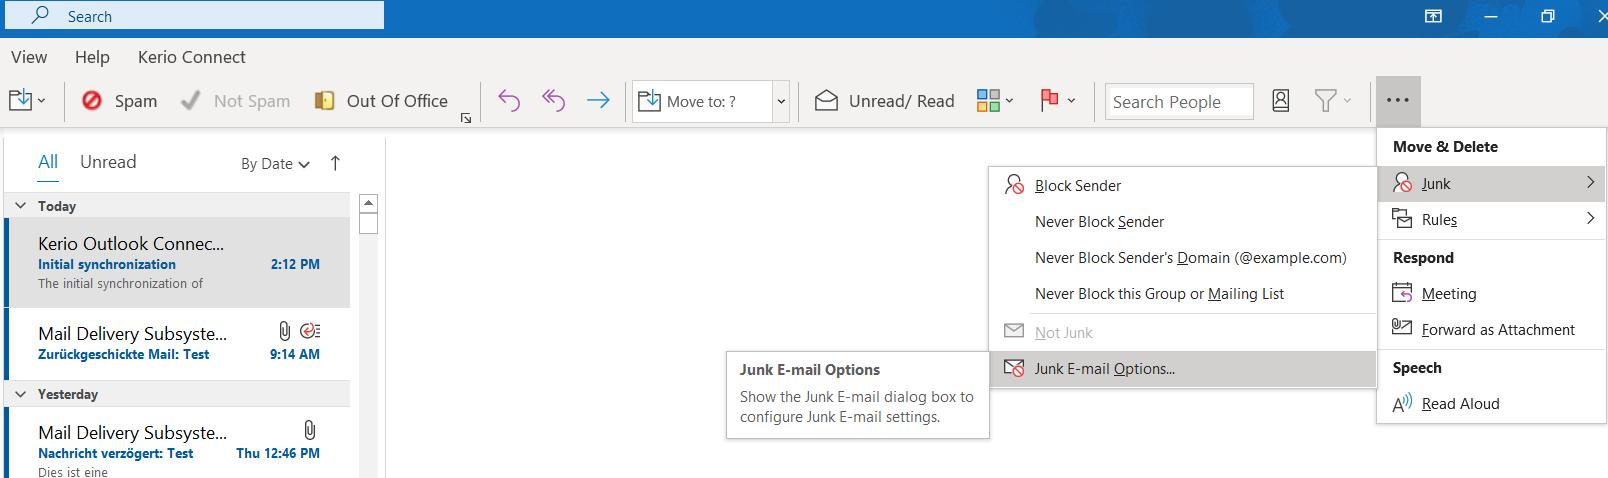 junk_emails1.png